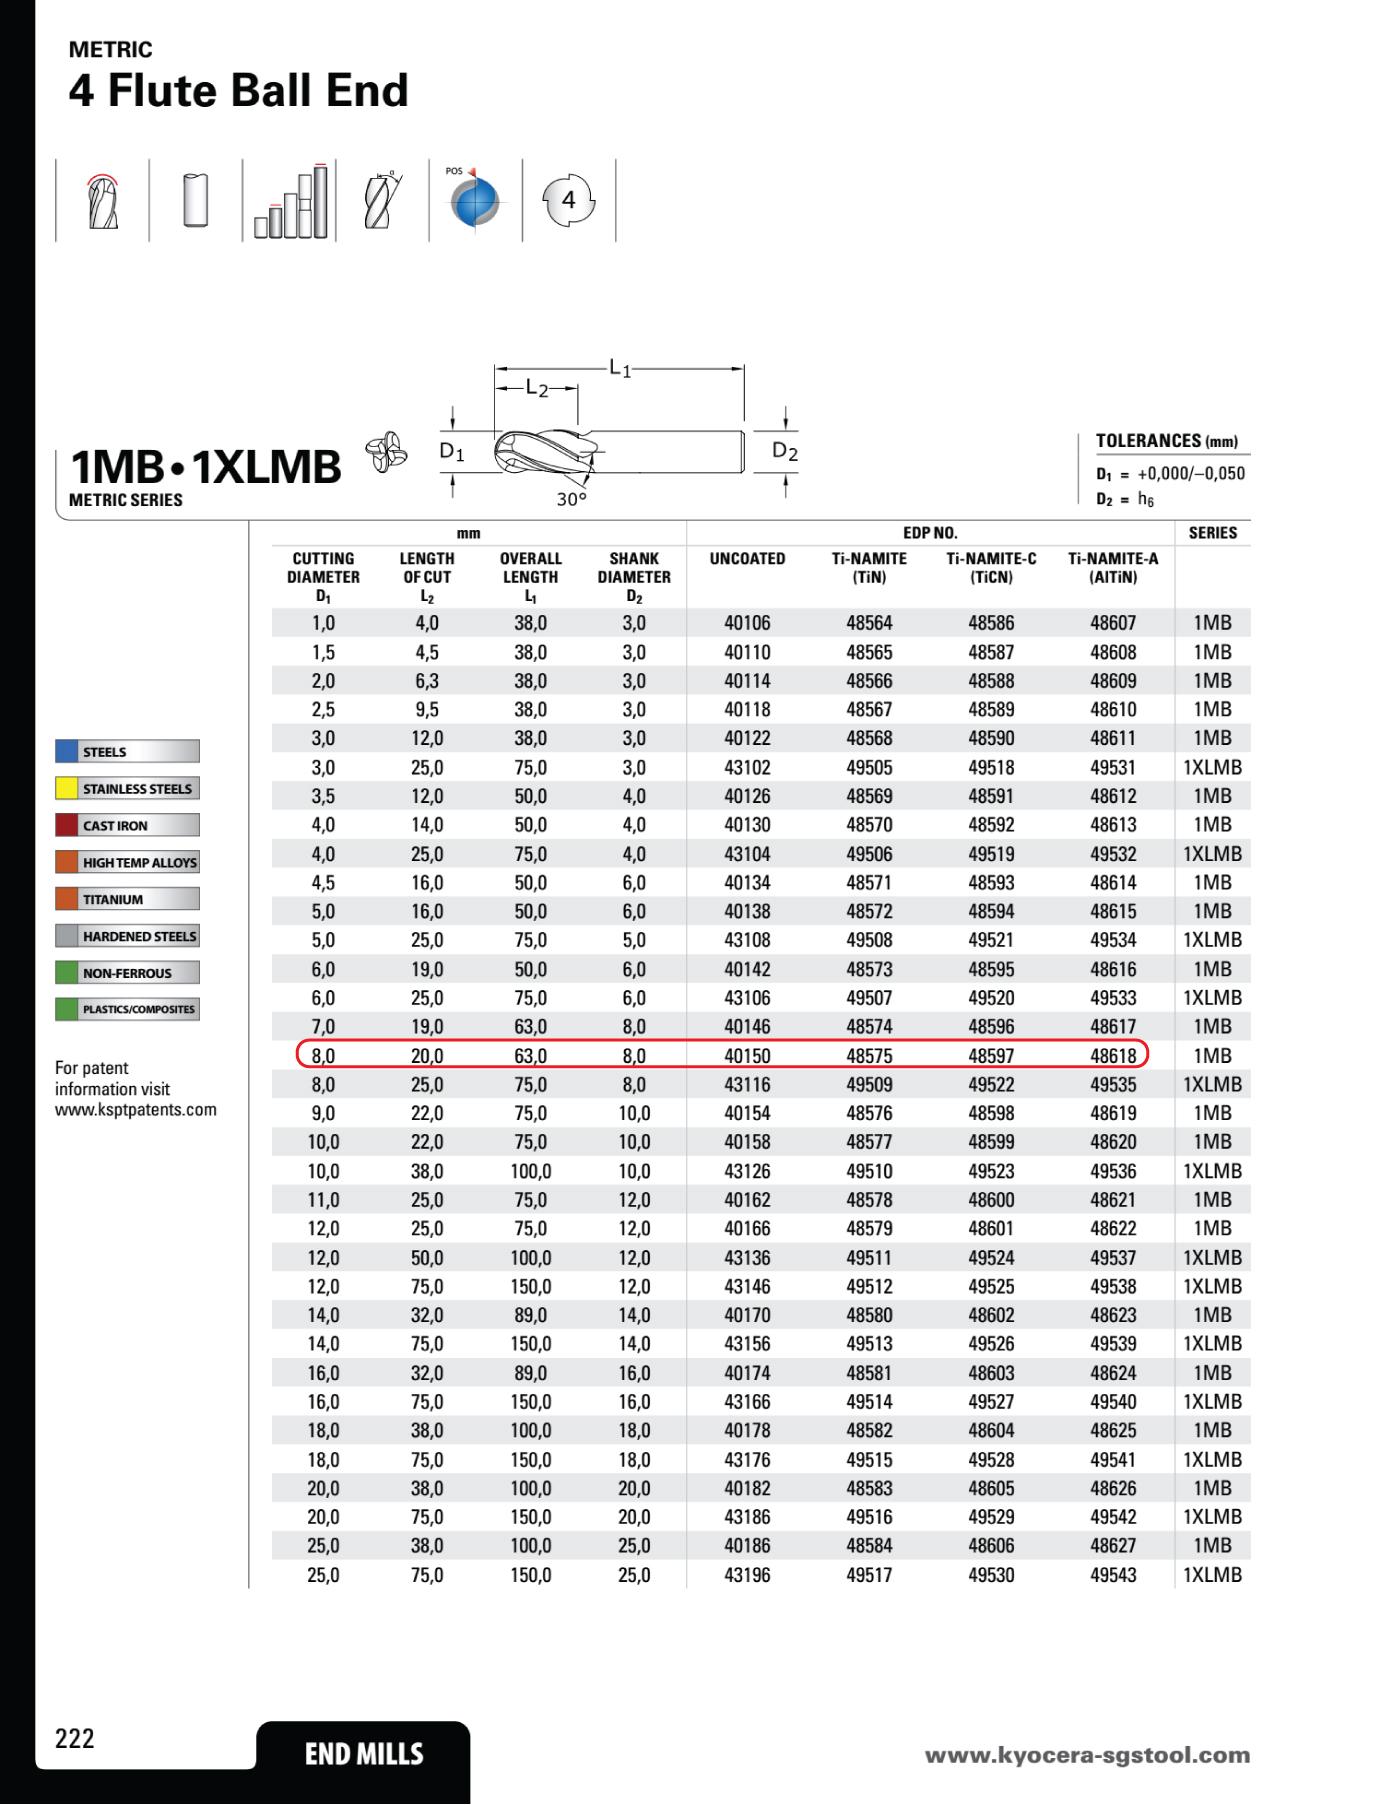 DAO PHAY CẦU 4F PHI 8 KYOCERA SGS KSP48618